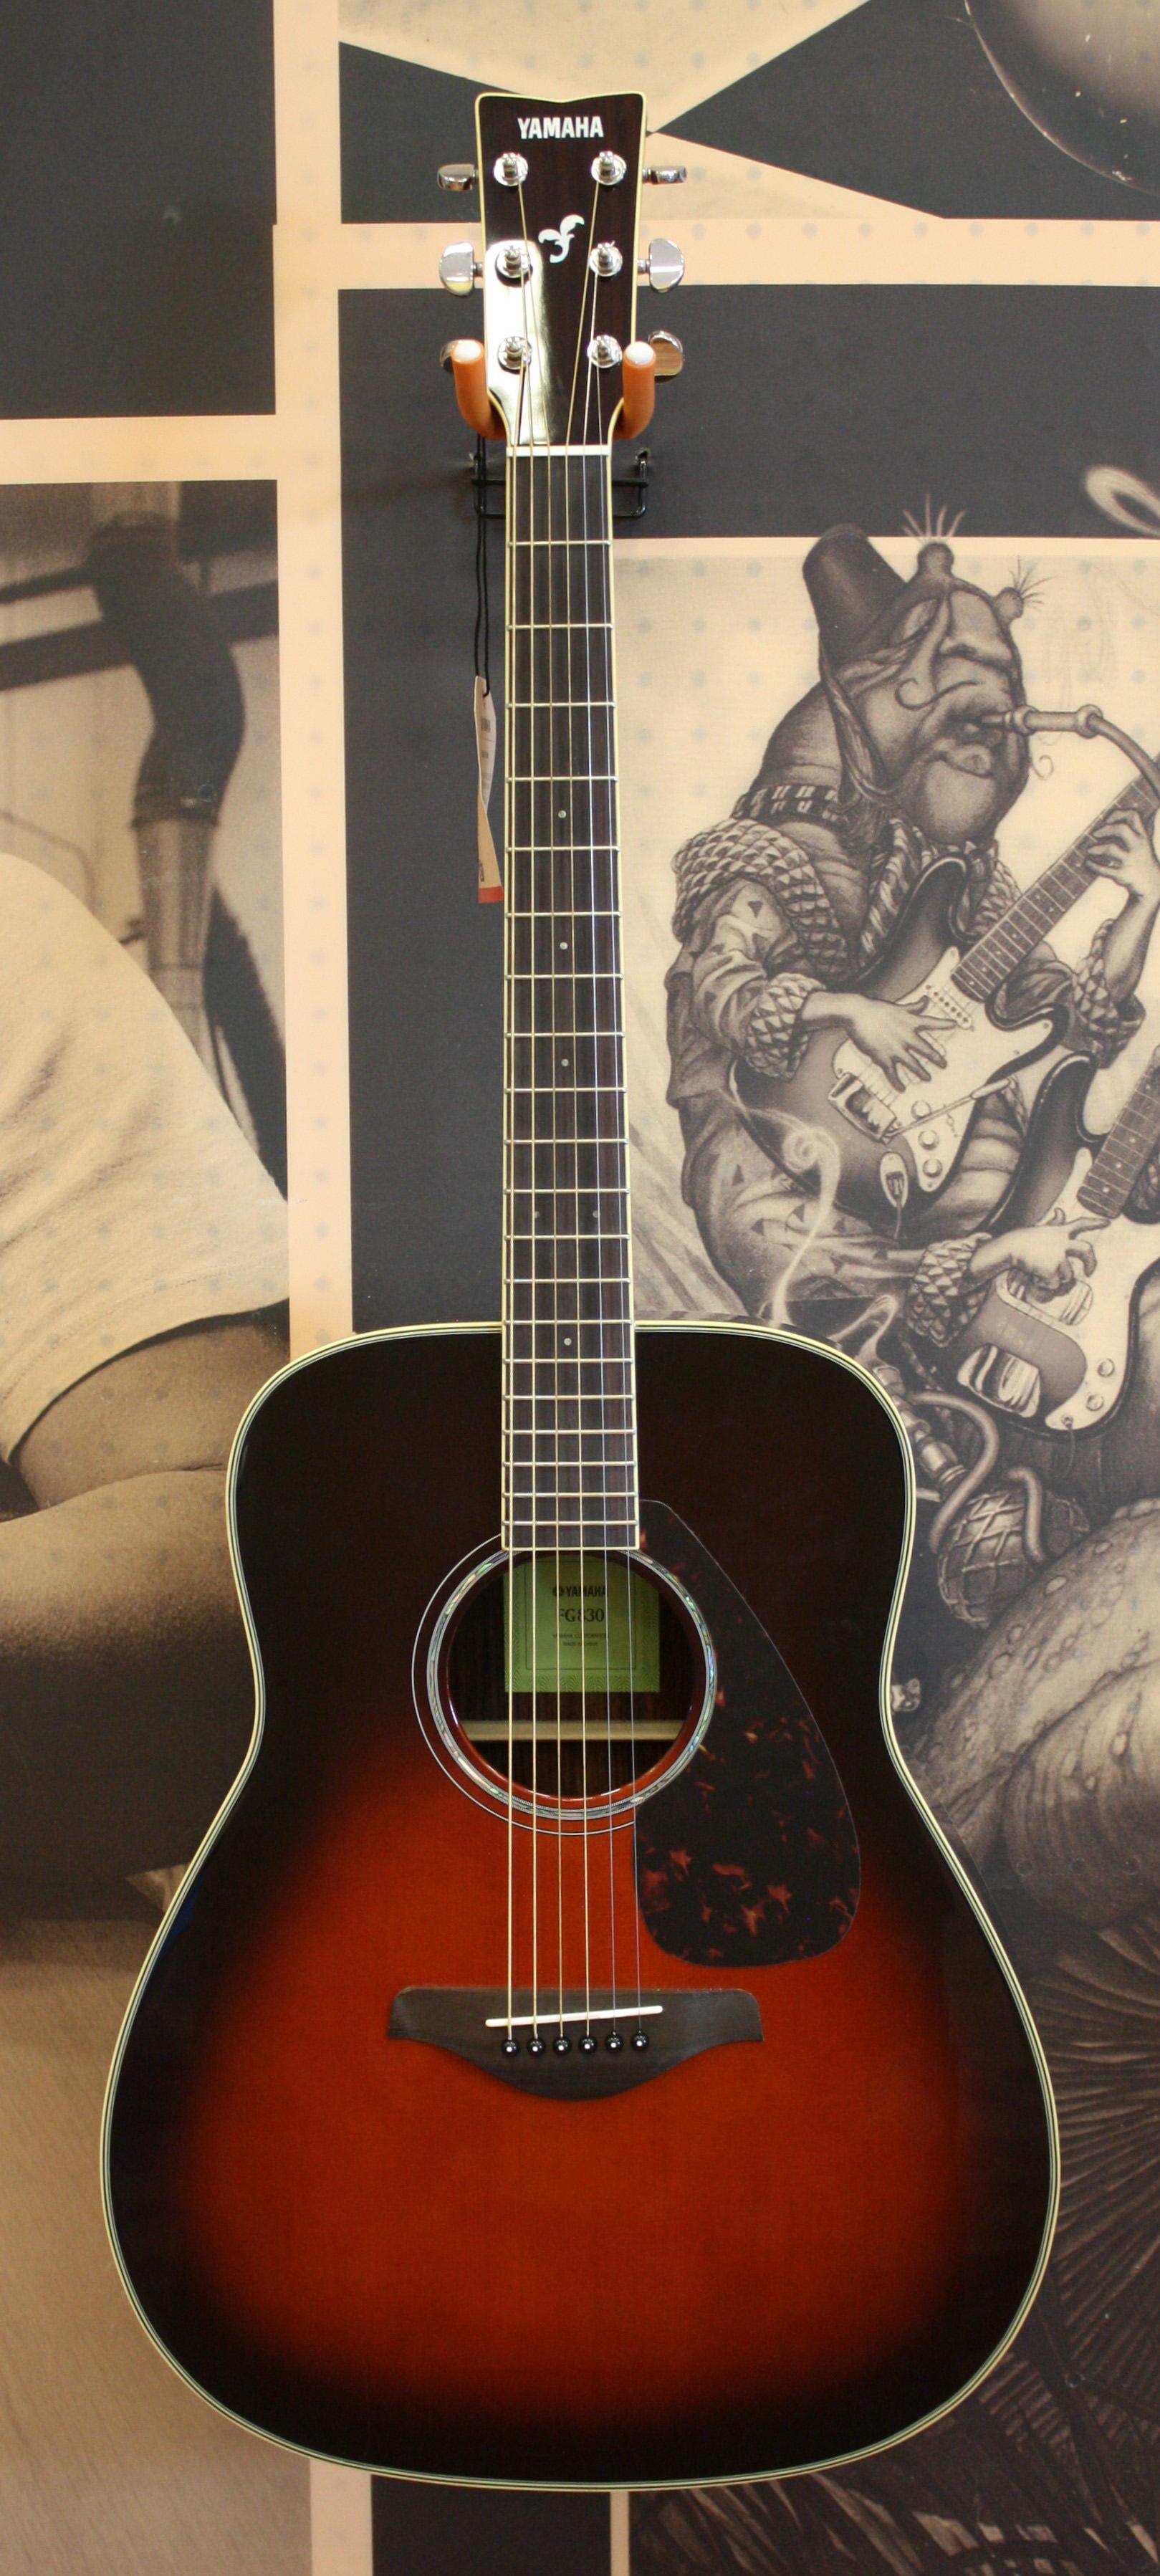 eaefec44ad Yamaha FG830 Solid Top Folk Acoustic Guitar - Tobacco Sunburst. Состояние: